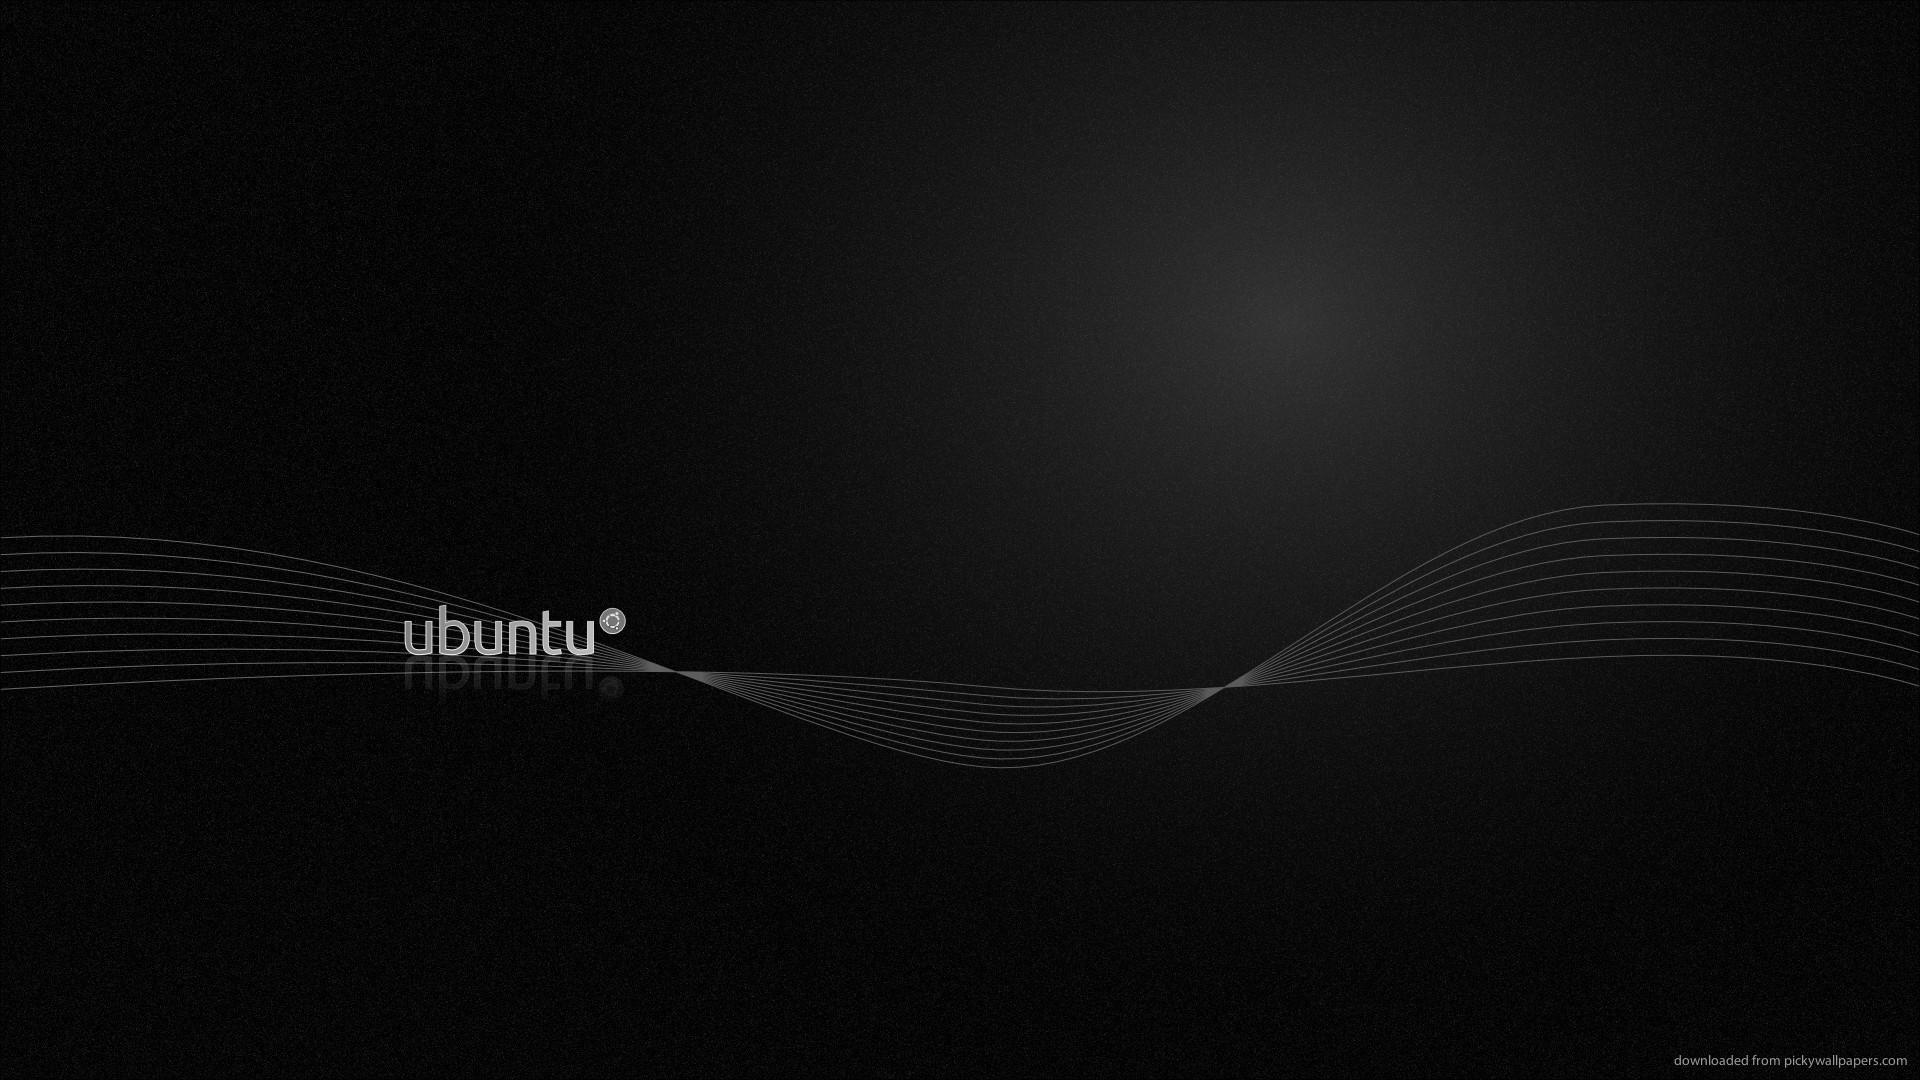 Ubuntu Backgrounds (73+ images) Ubuntu Server Wallpaper